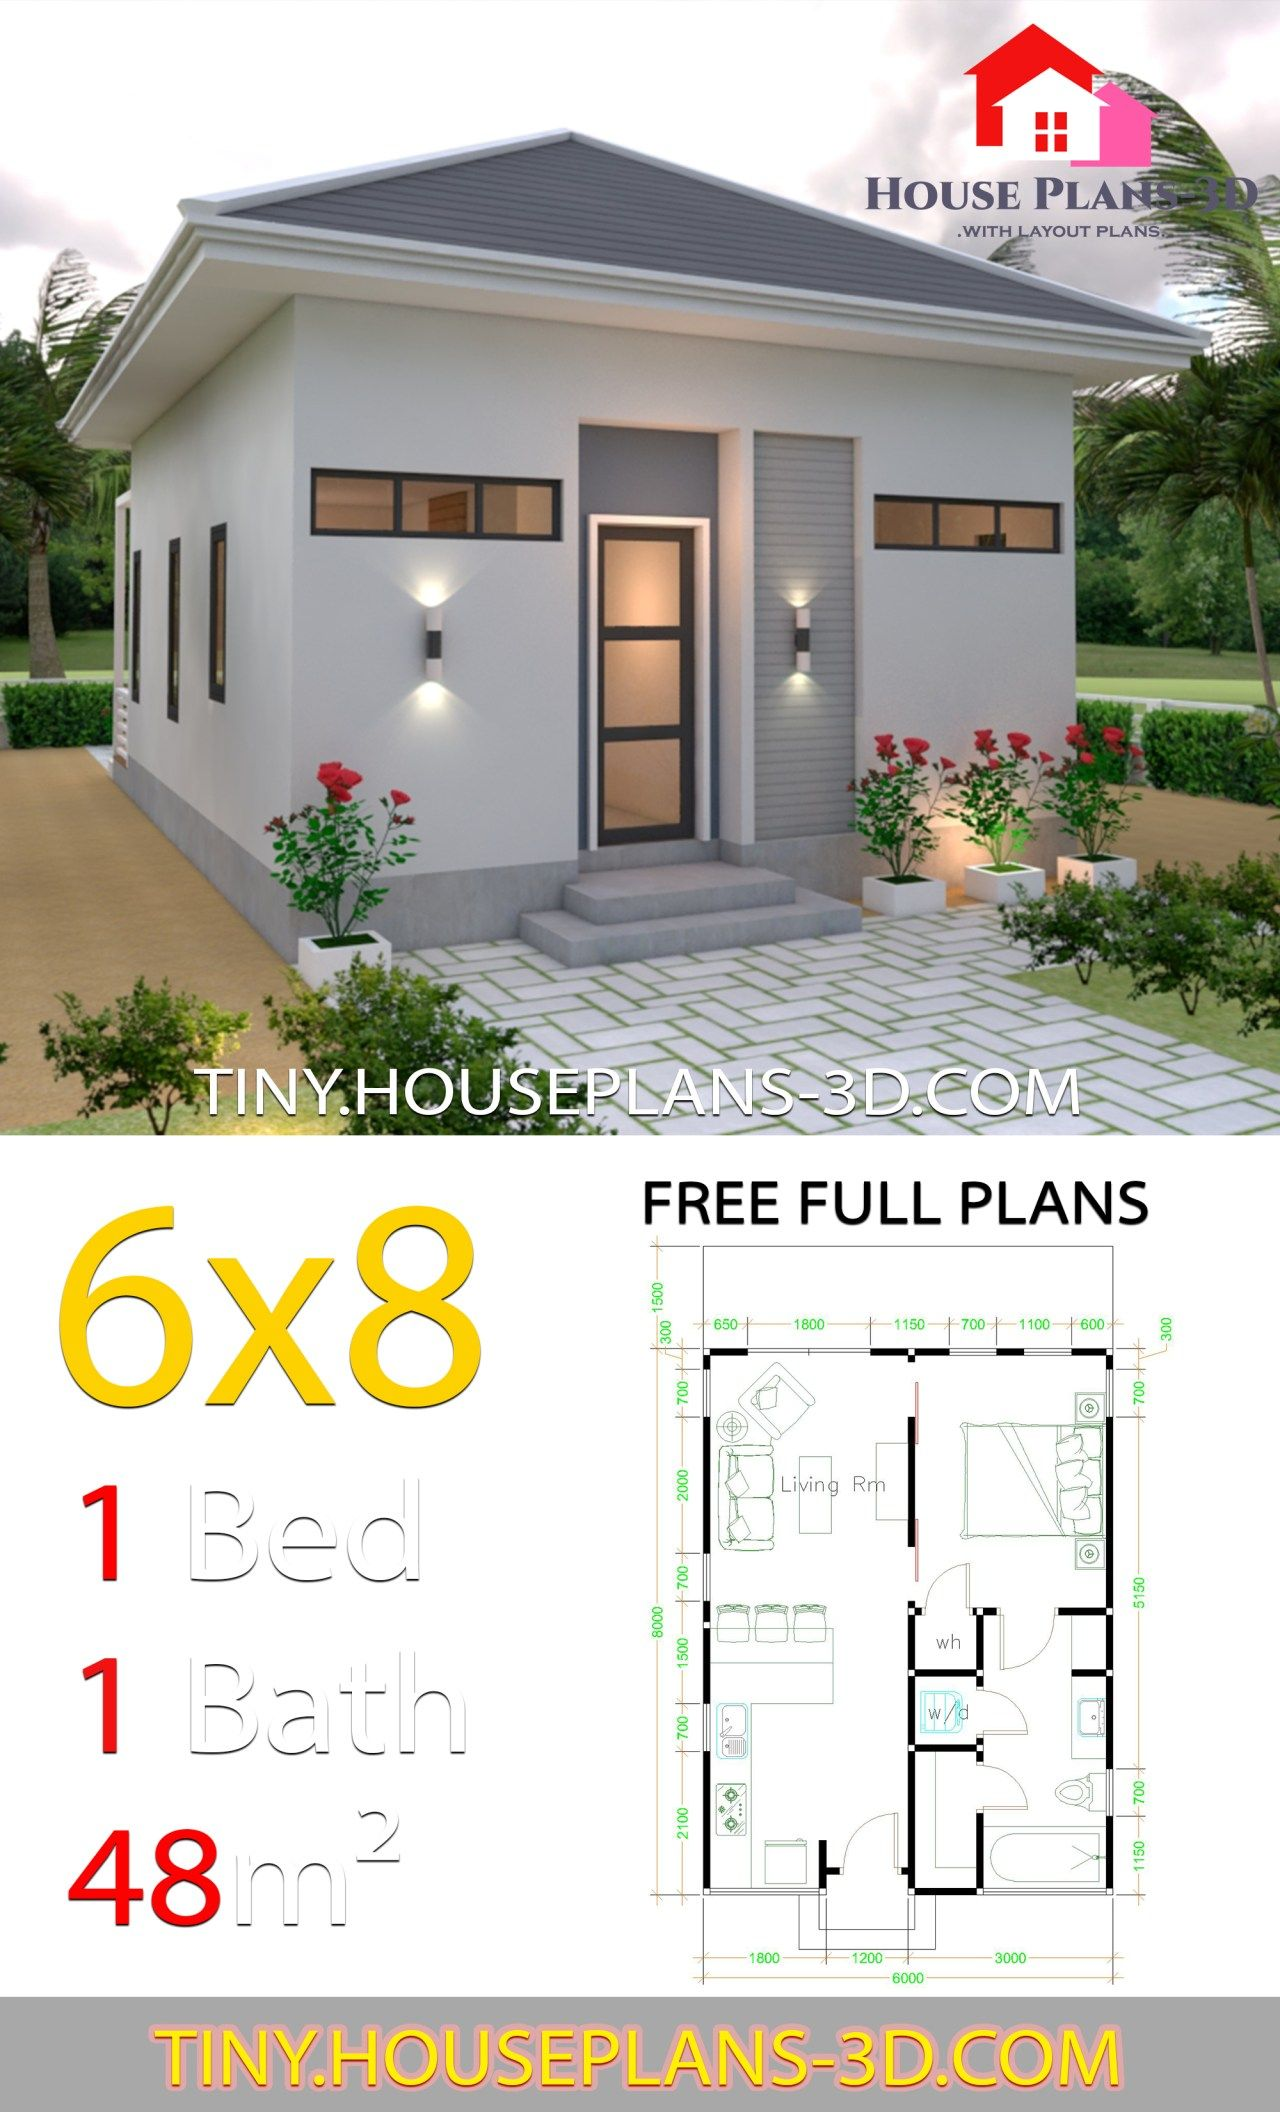 Studio House Plans 6x8 Hip Roof Tiny House Plans Tiny House Plans My House Plans House Plans